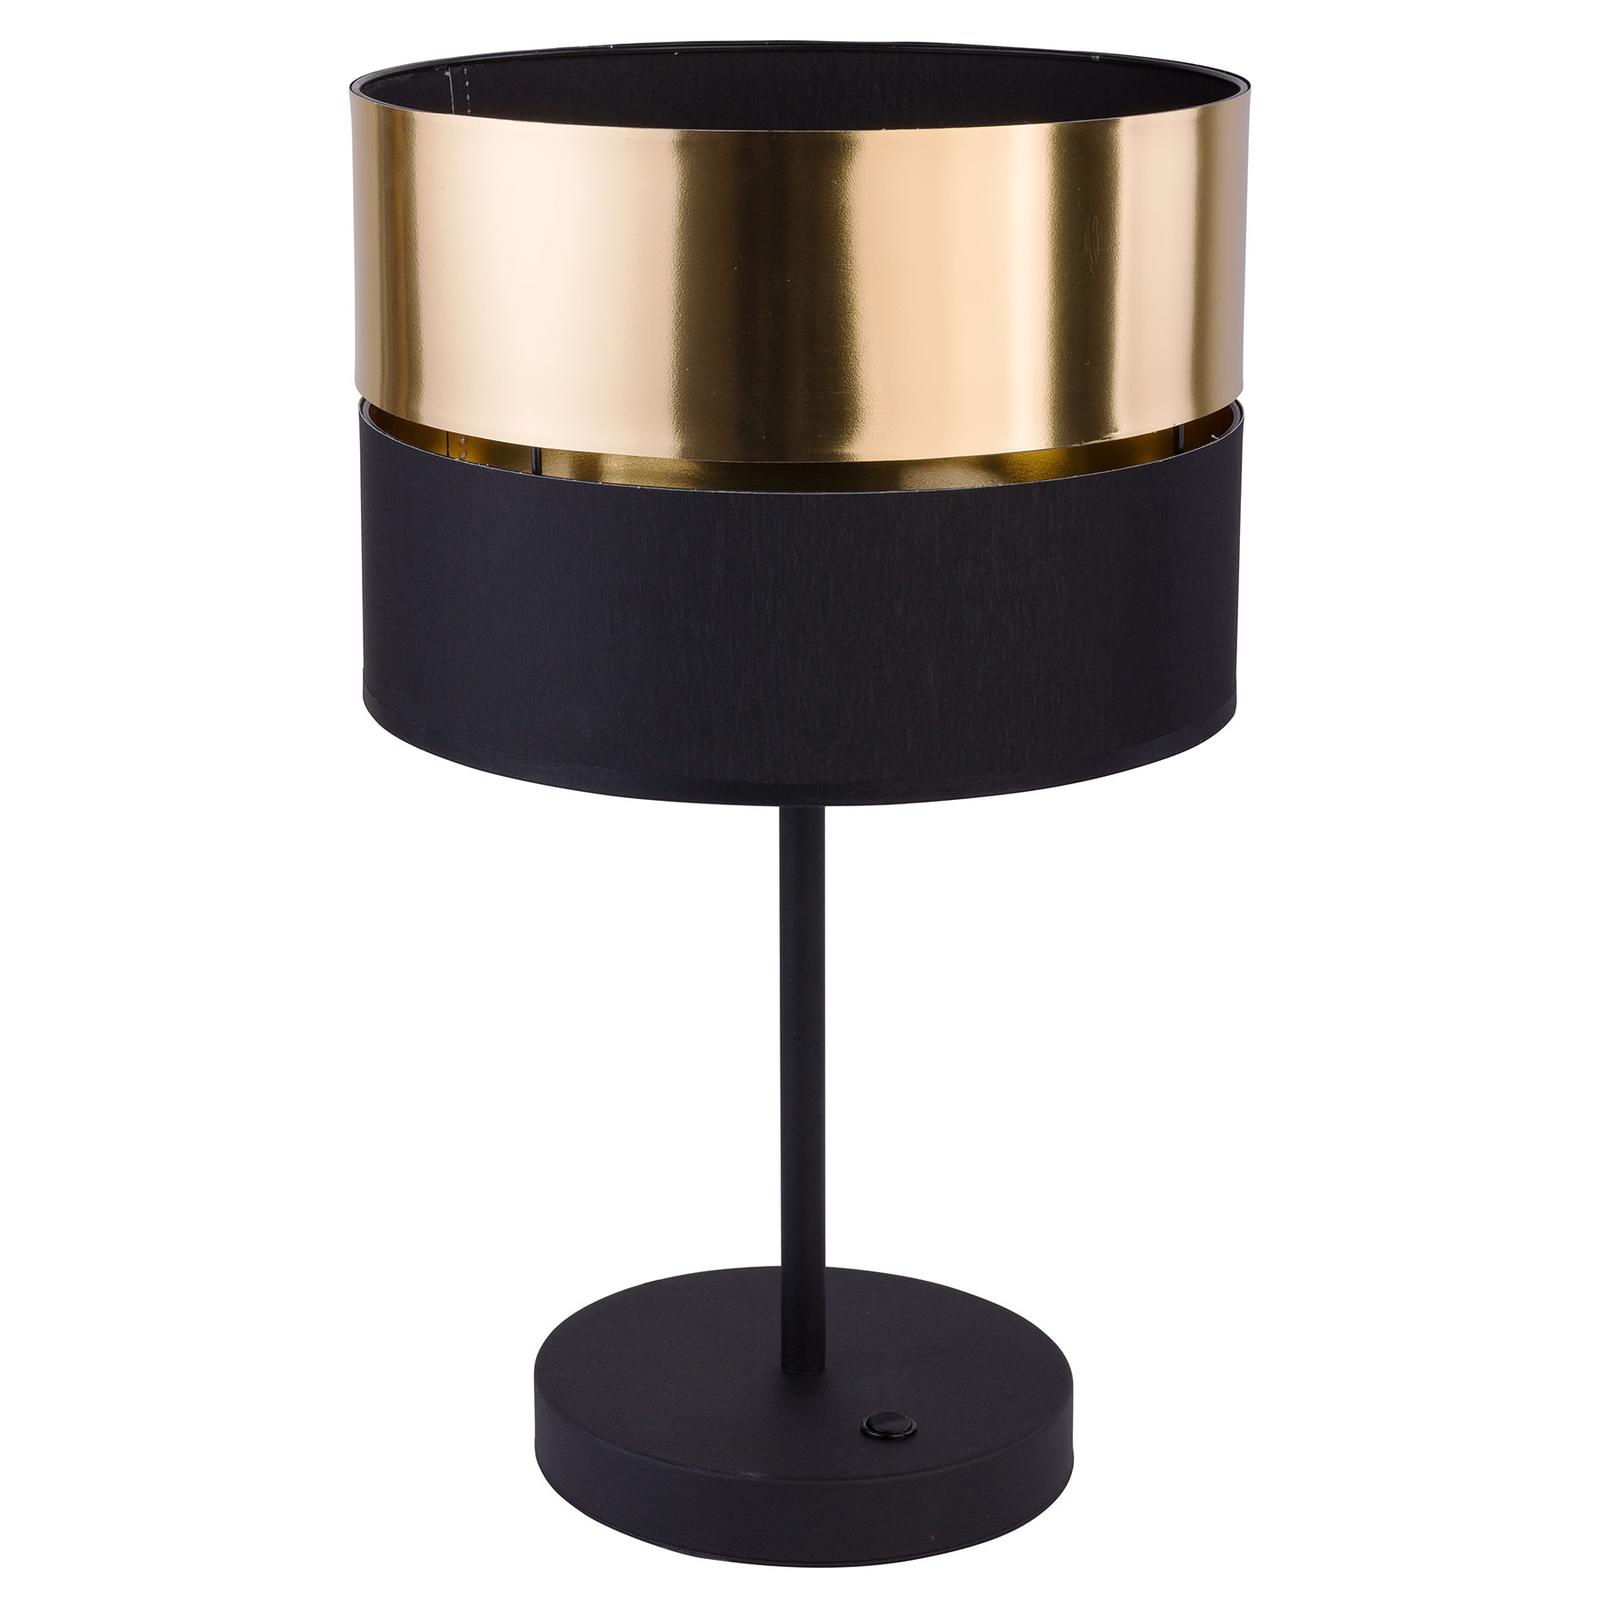 Bordlampe Hilton, svart/gull